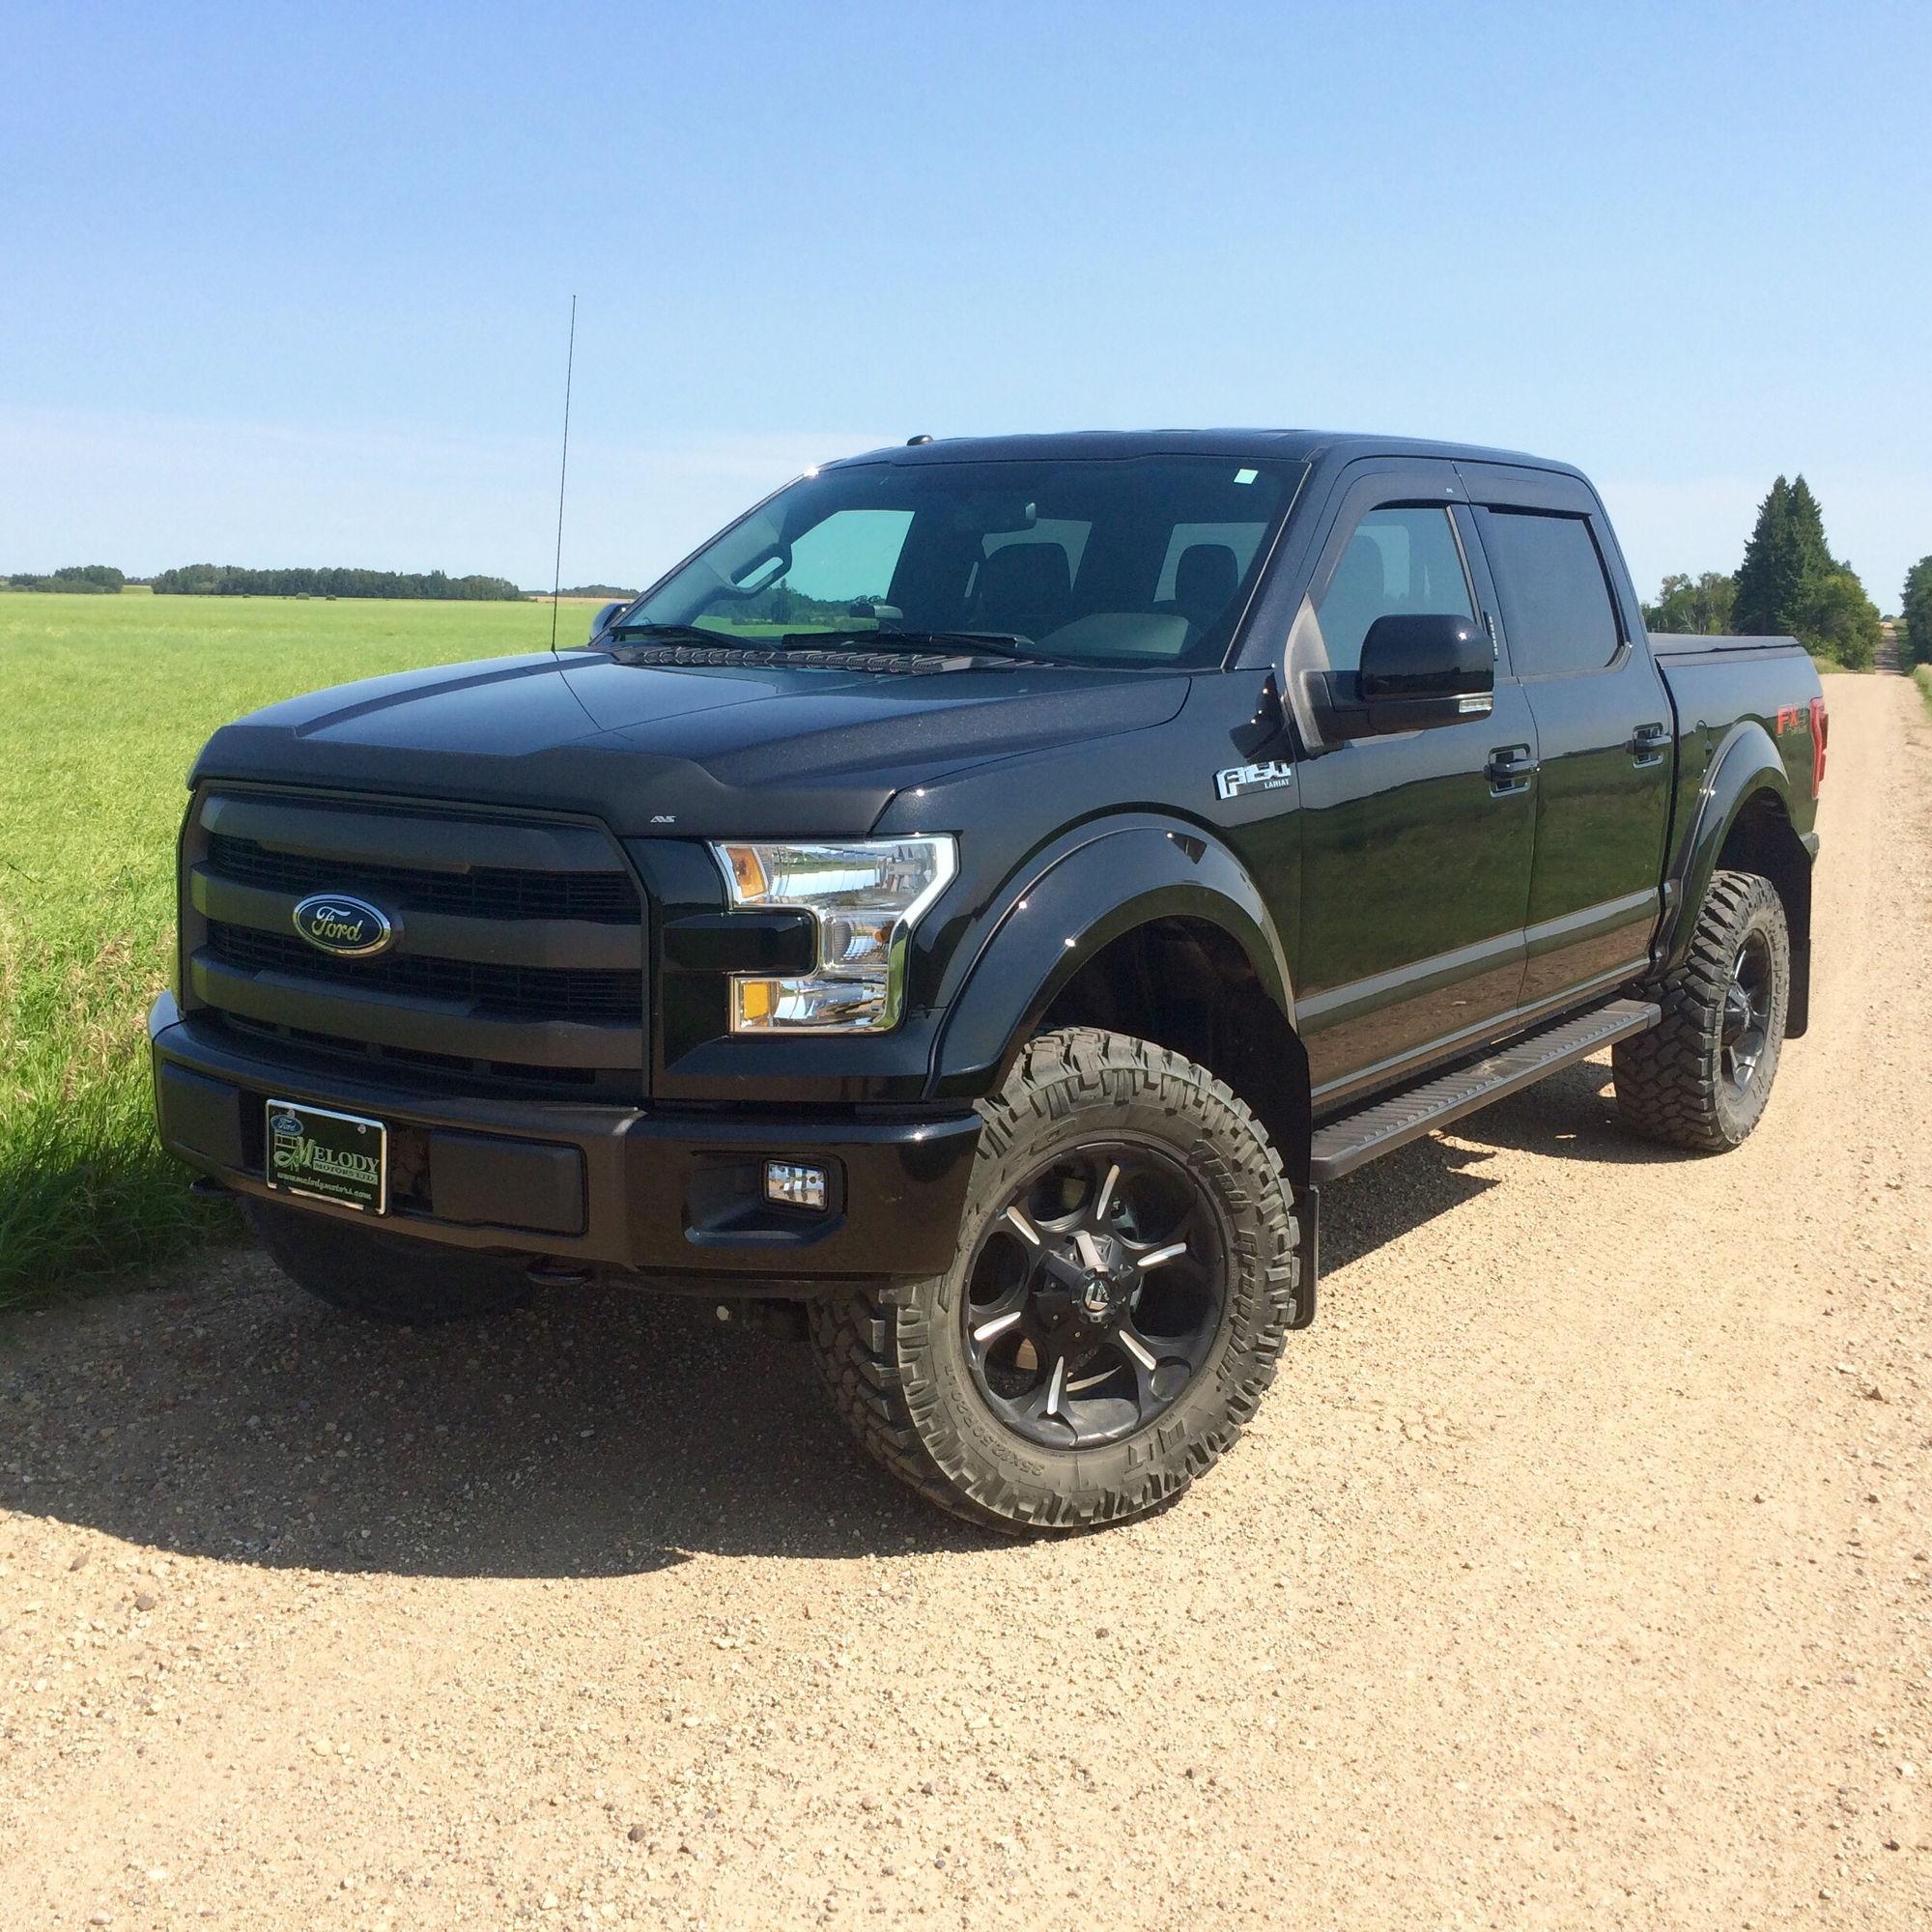 4 bds lift 35 x12 5 x20 nitto trail grapplers 20 black fuel dune wheels bushwacker extend a fenders kickback mudflaps extang tonneau cover